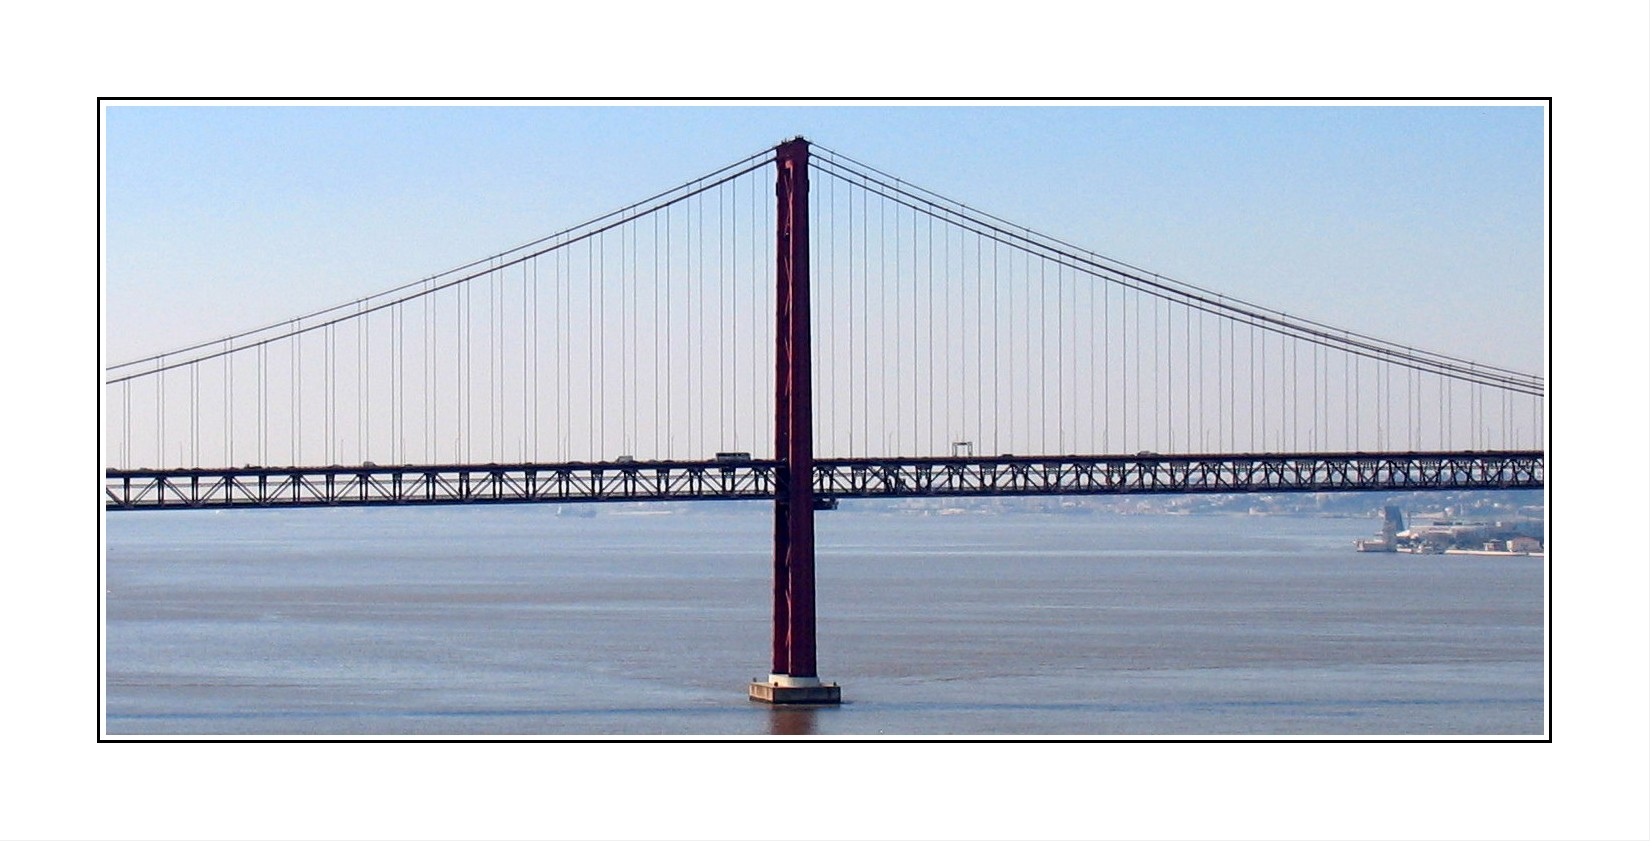 Hängebrücke über den Tejo.